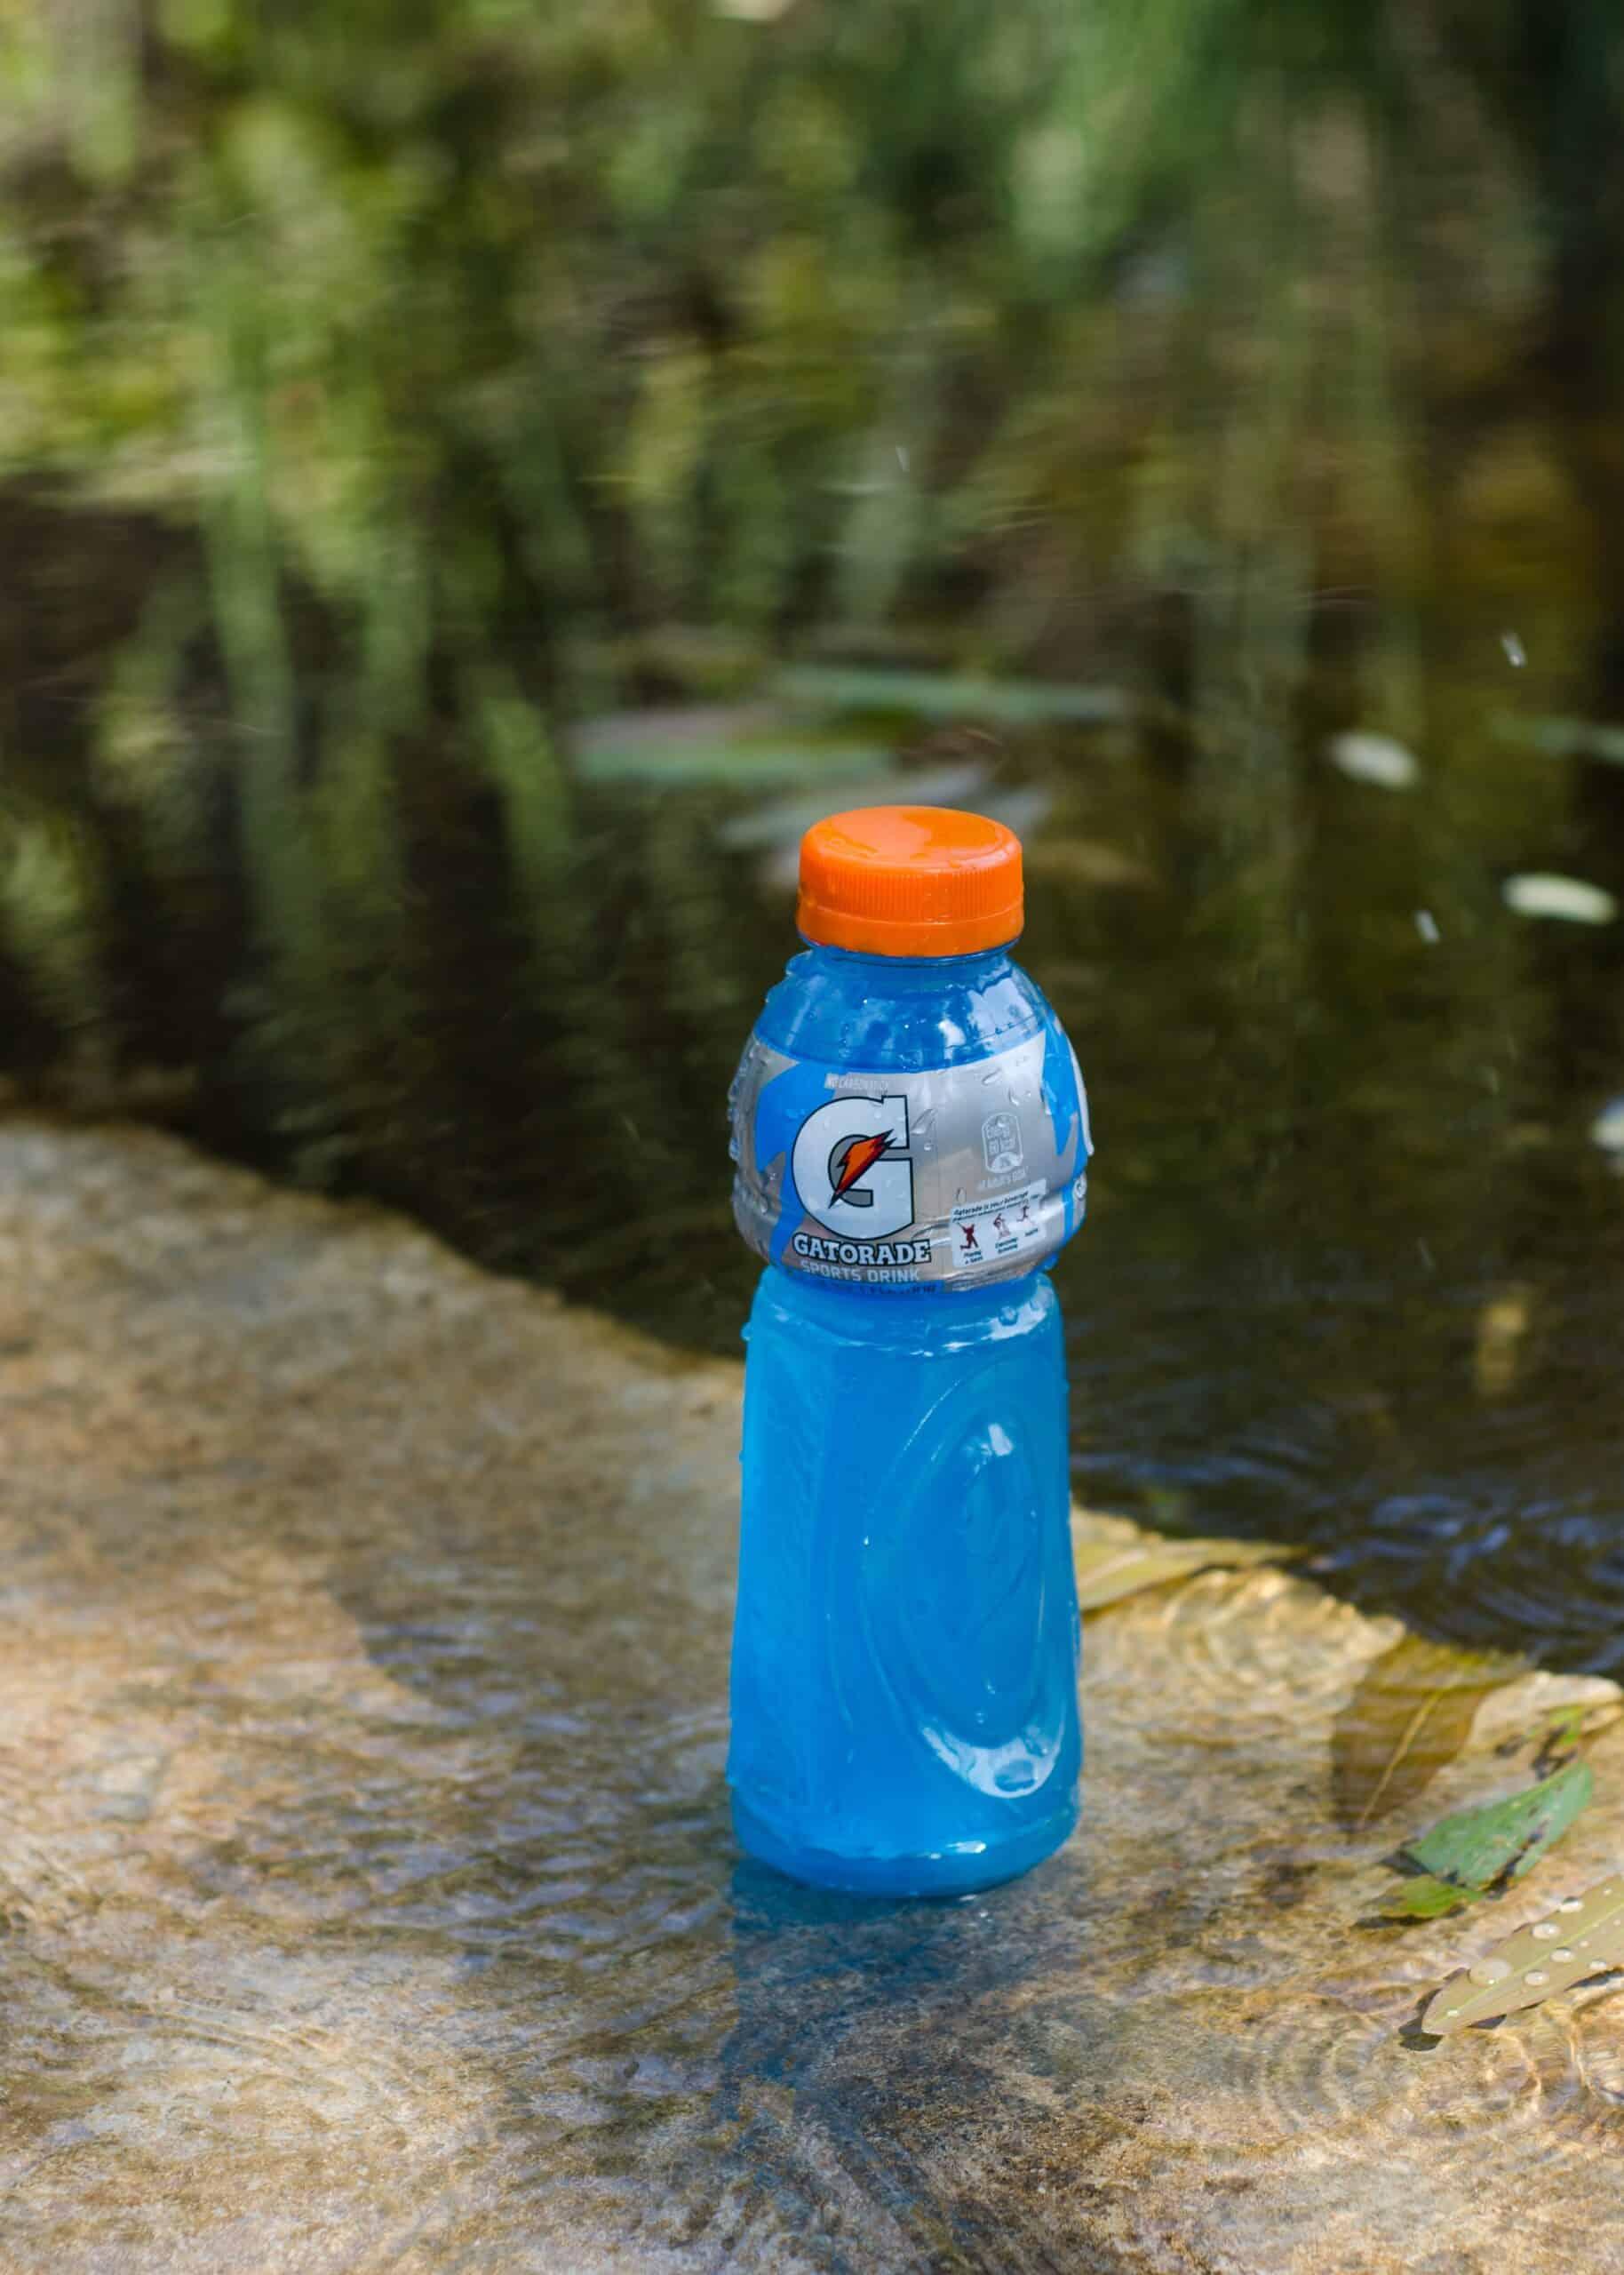 bottle of gatorade next to a pond